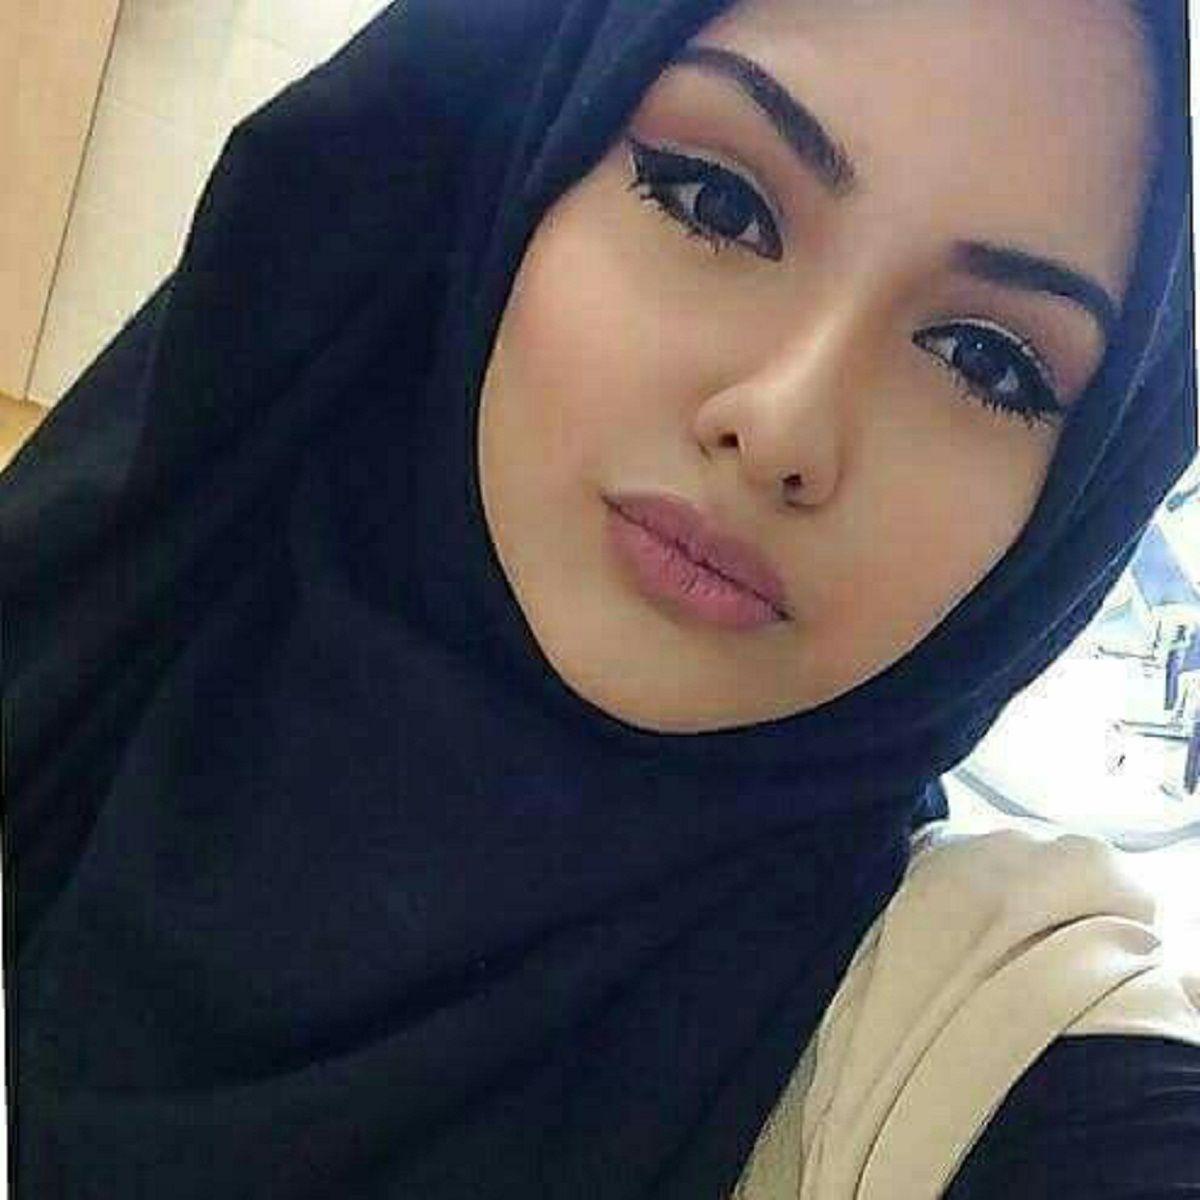 بالصور بنات السعوديه , العرب وجمال بنات السعوديه 6637 7